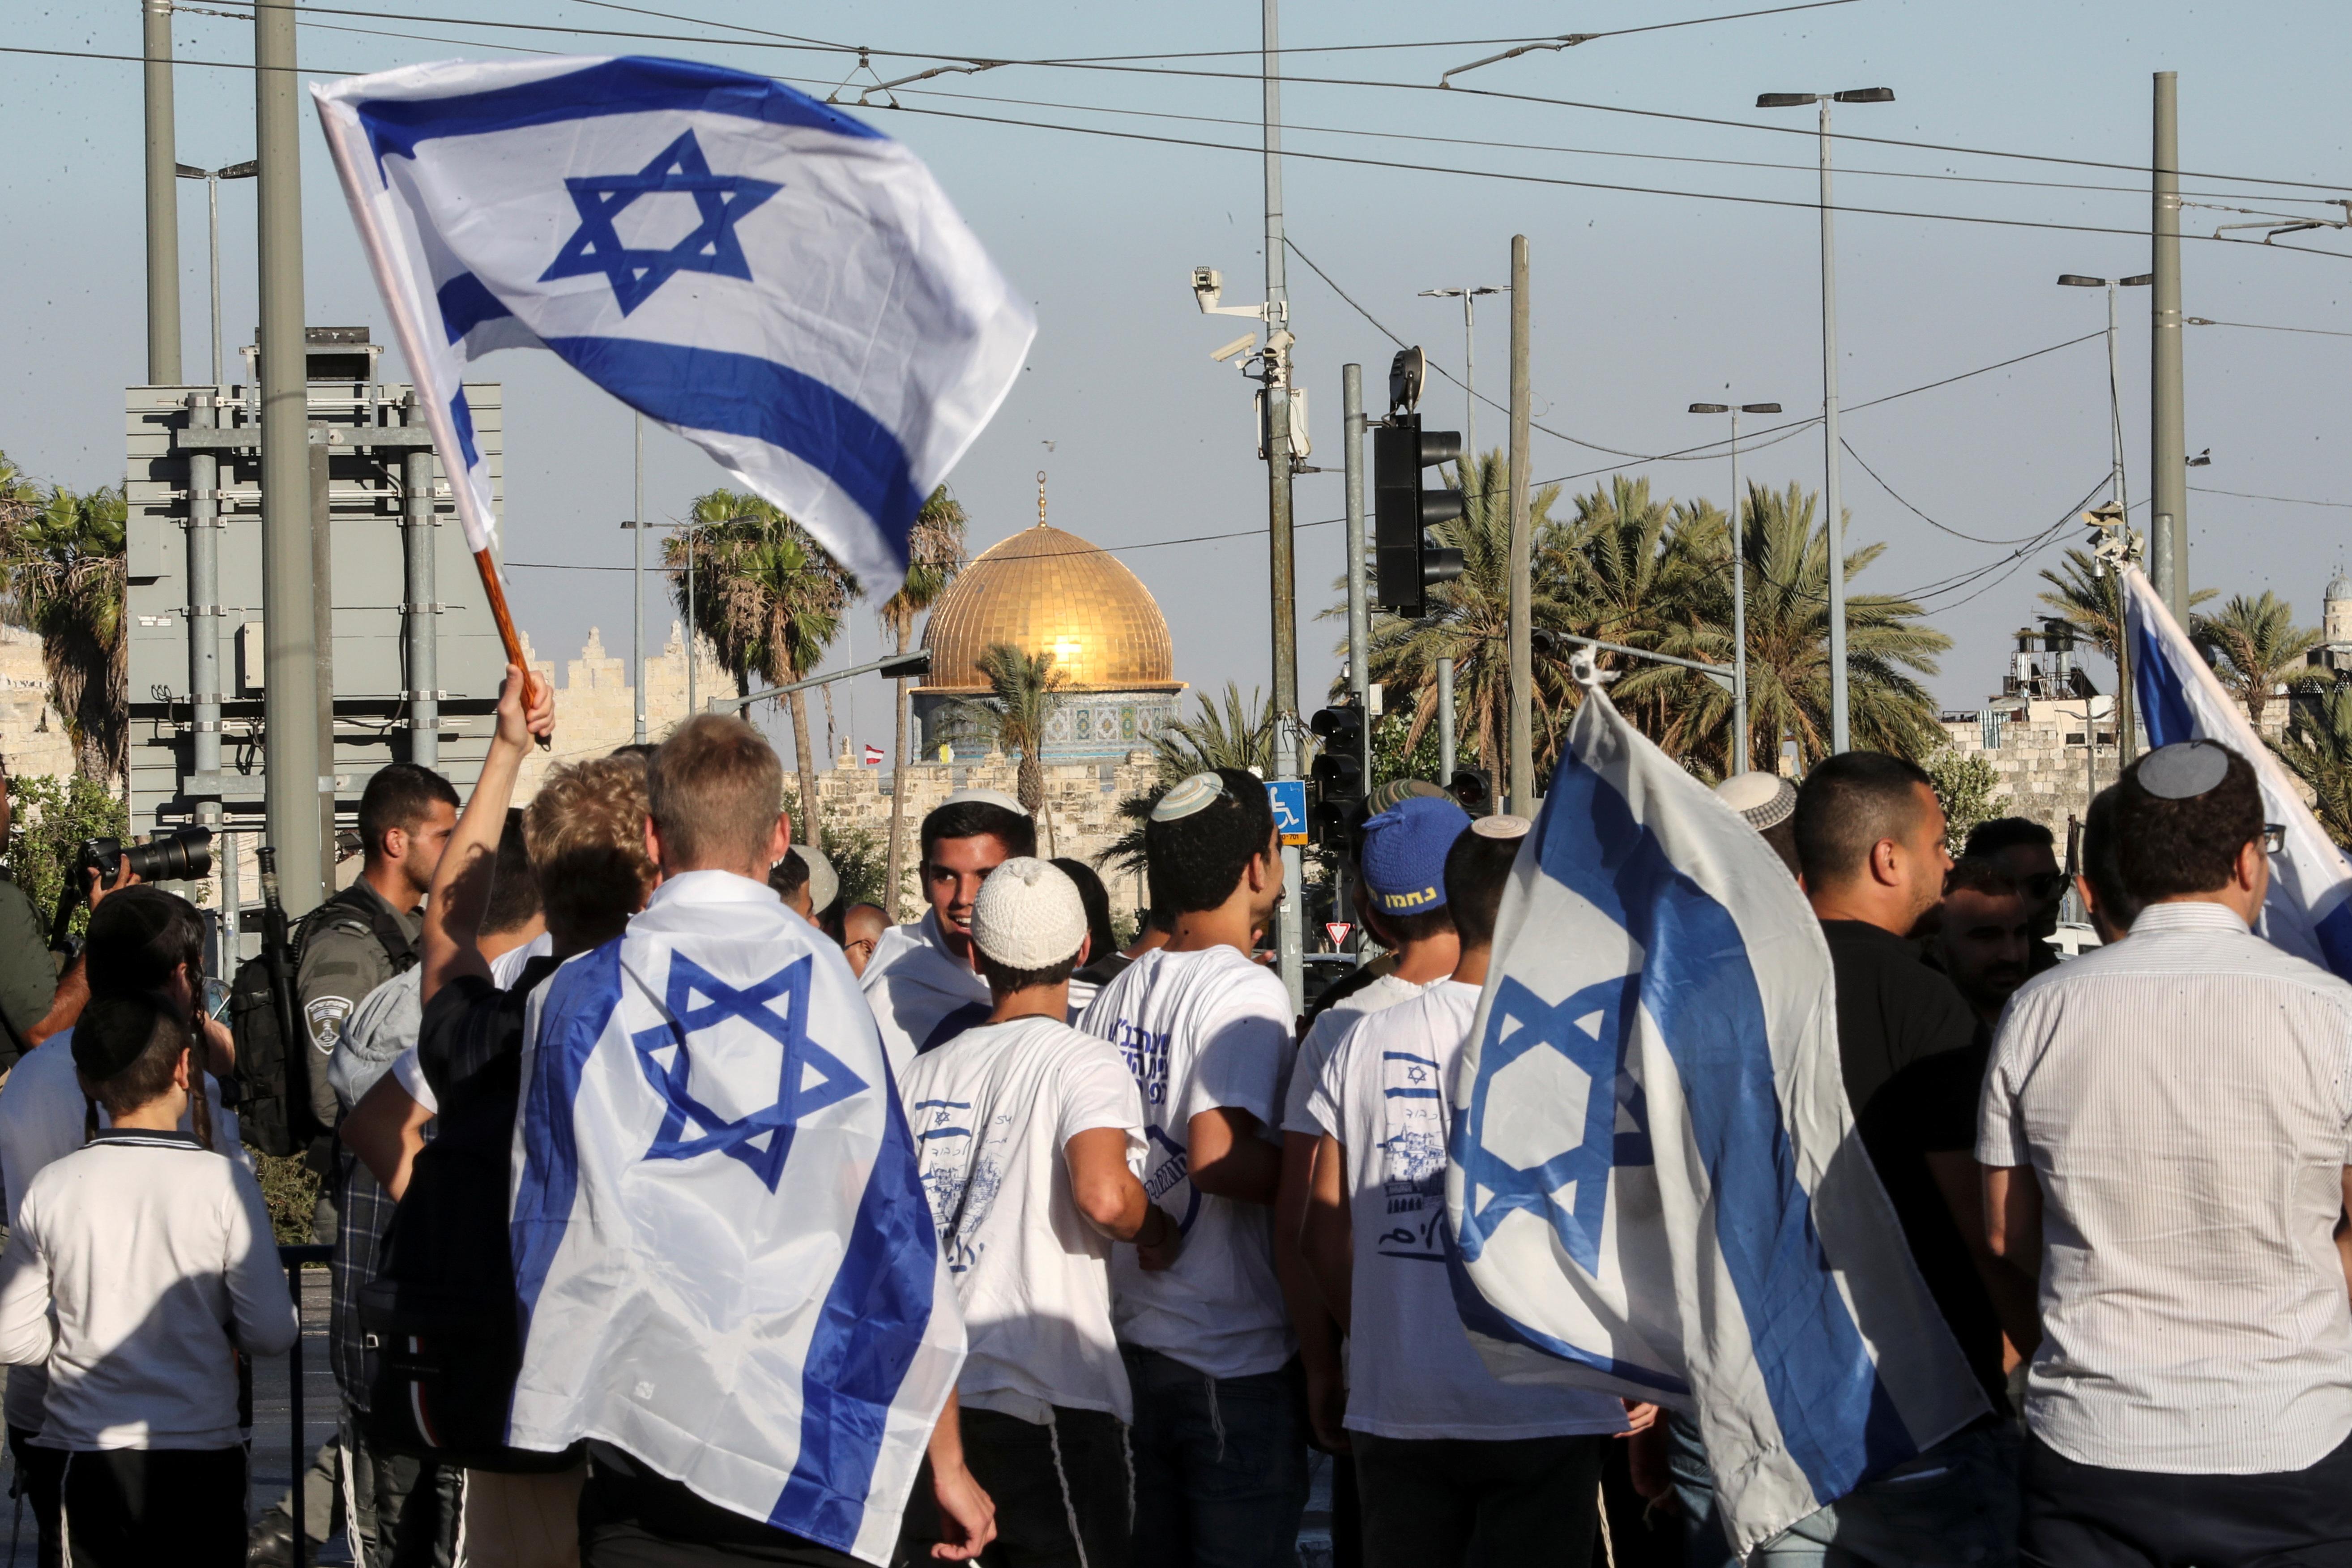 Israelis walk with flags outside Jerusalem's Old City,  June 15,2021. REUTERS/Ronen Zvulun